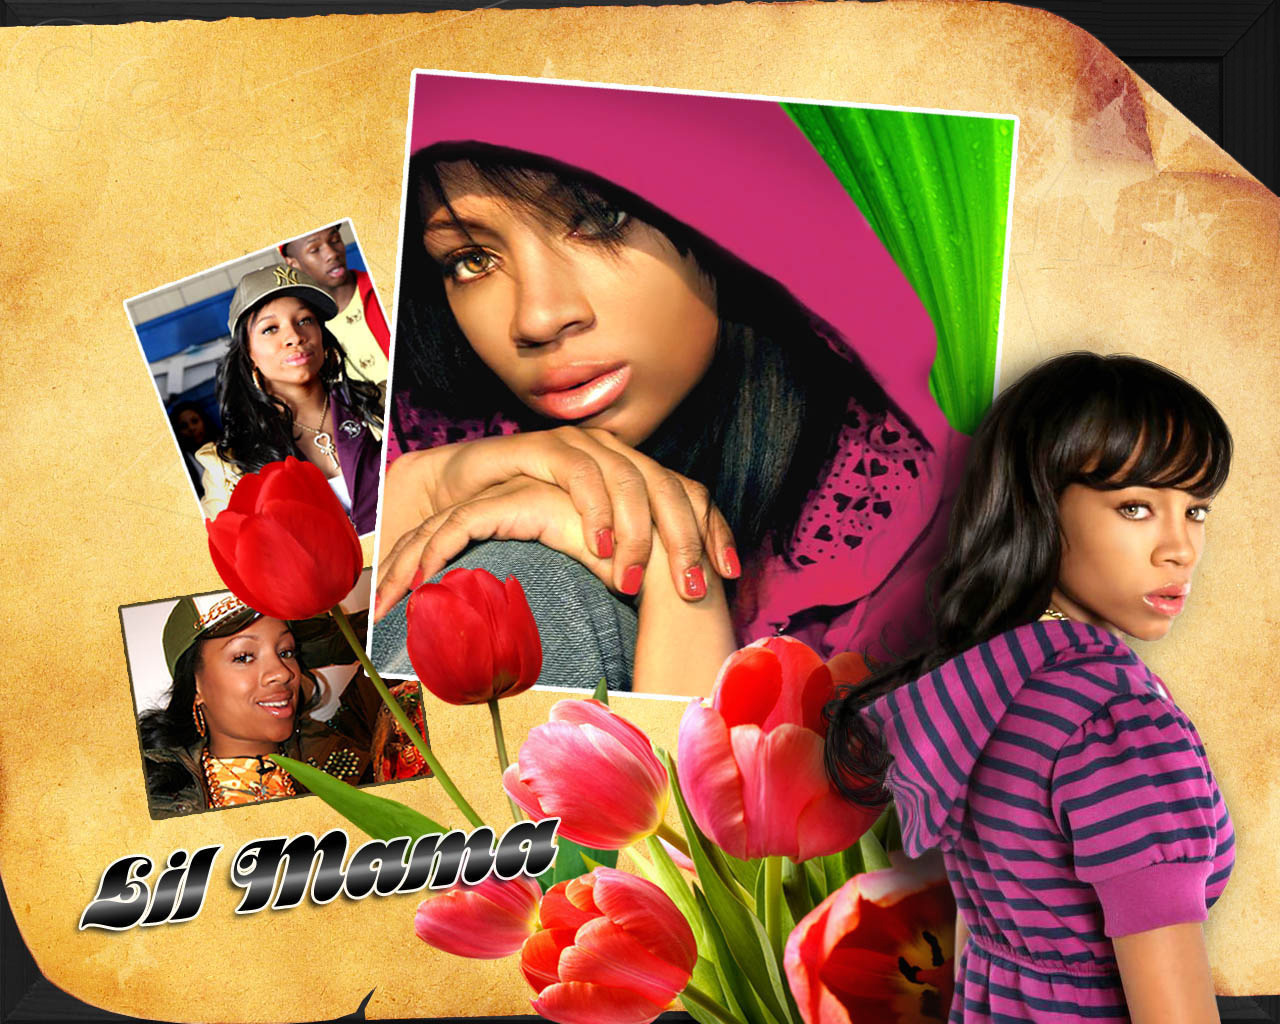 http://2.bp.blogspot.com/-rT-H0cV4p6k/T2fo0HkEIKI/AAAAAAAAQA8/XjklIhBHCmI/s1600/Lil+Mama-12.jpg